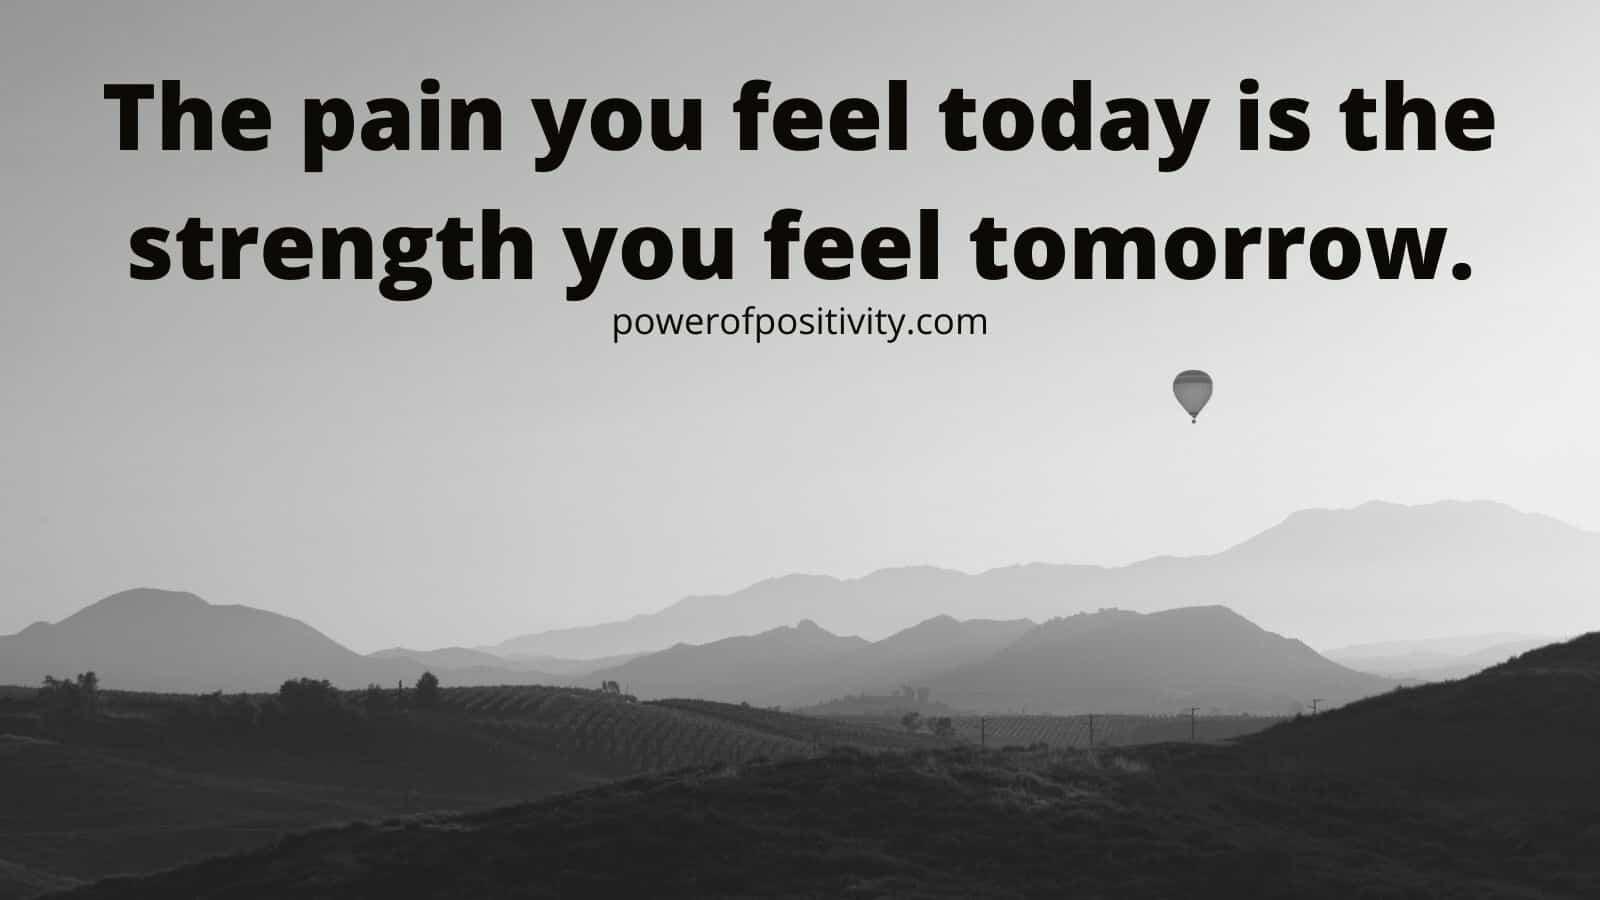 4 Uplifting Quotes to Make it Through Hard Times